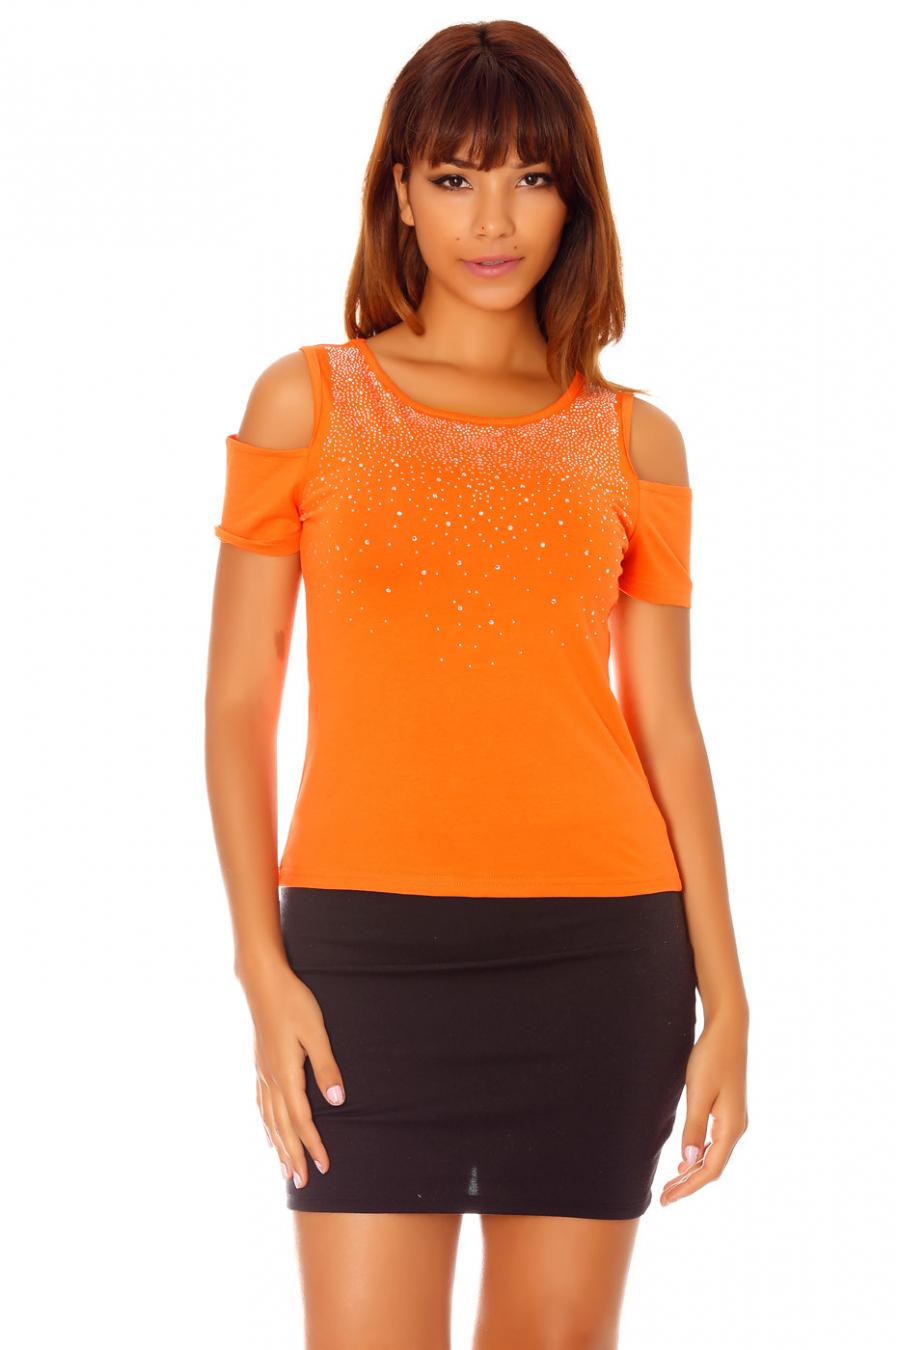 Top Orange à strass avec épaules dénudées. F227